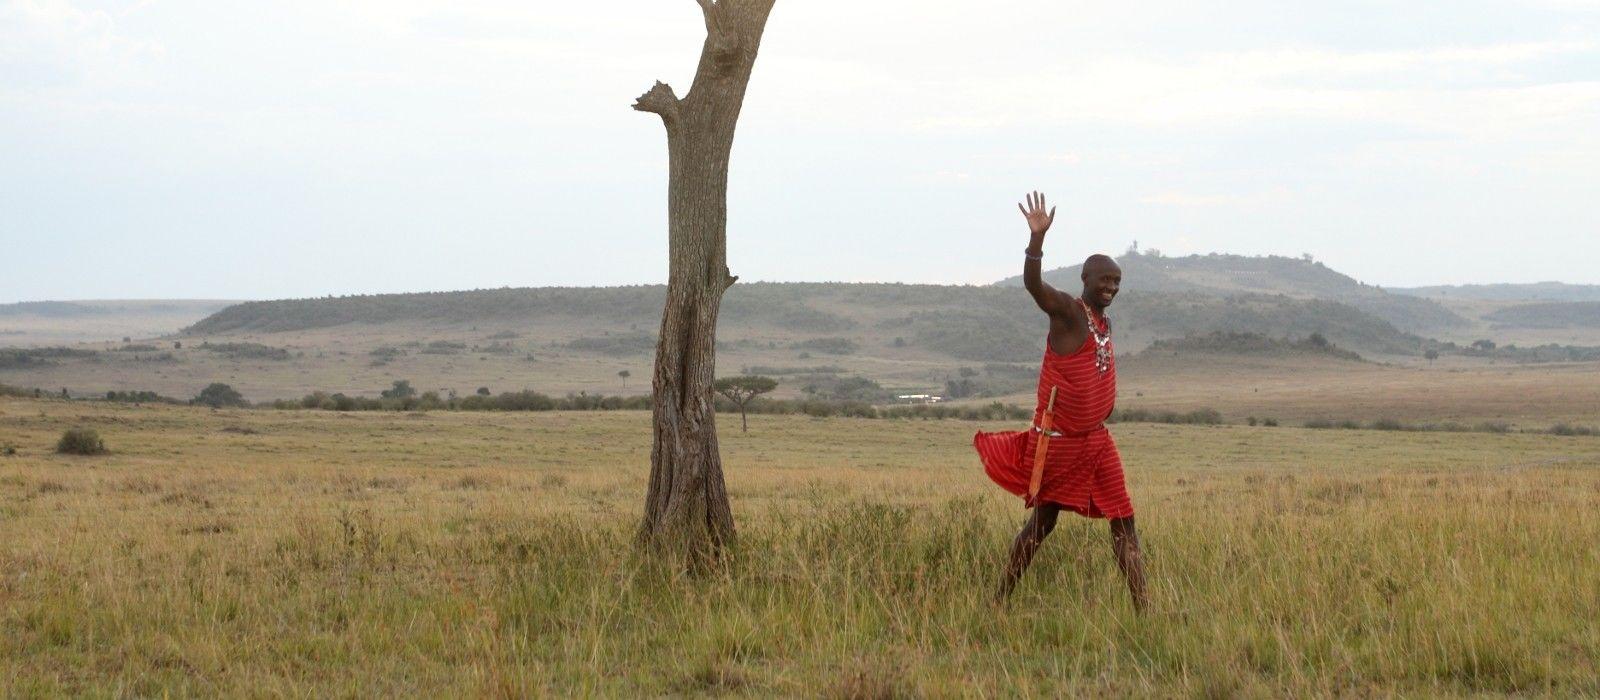 Kenia ganz Klassisch- Samburu, Masai Mara und Erholung am Strand Urlaub 6